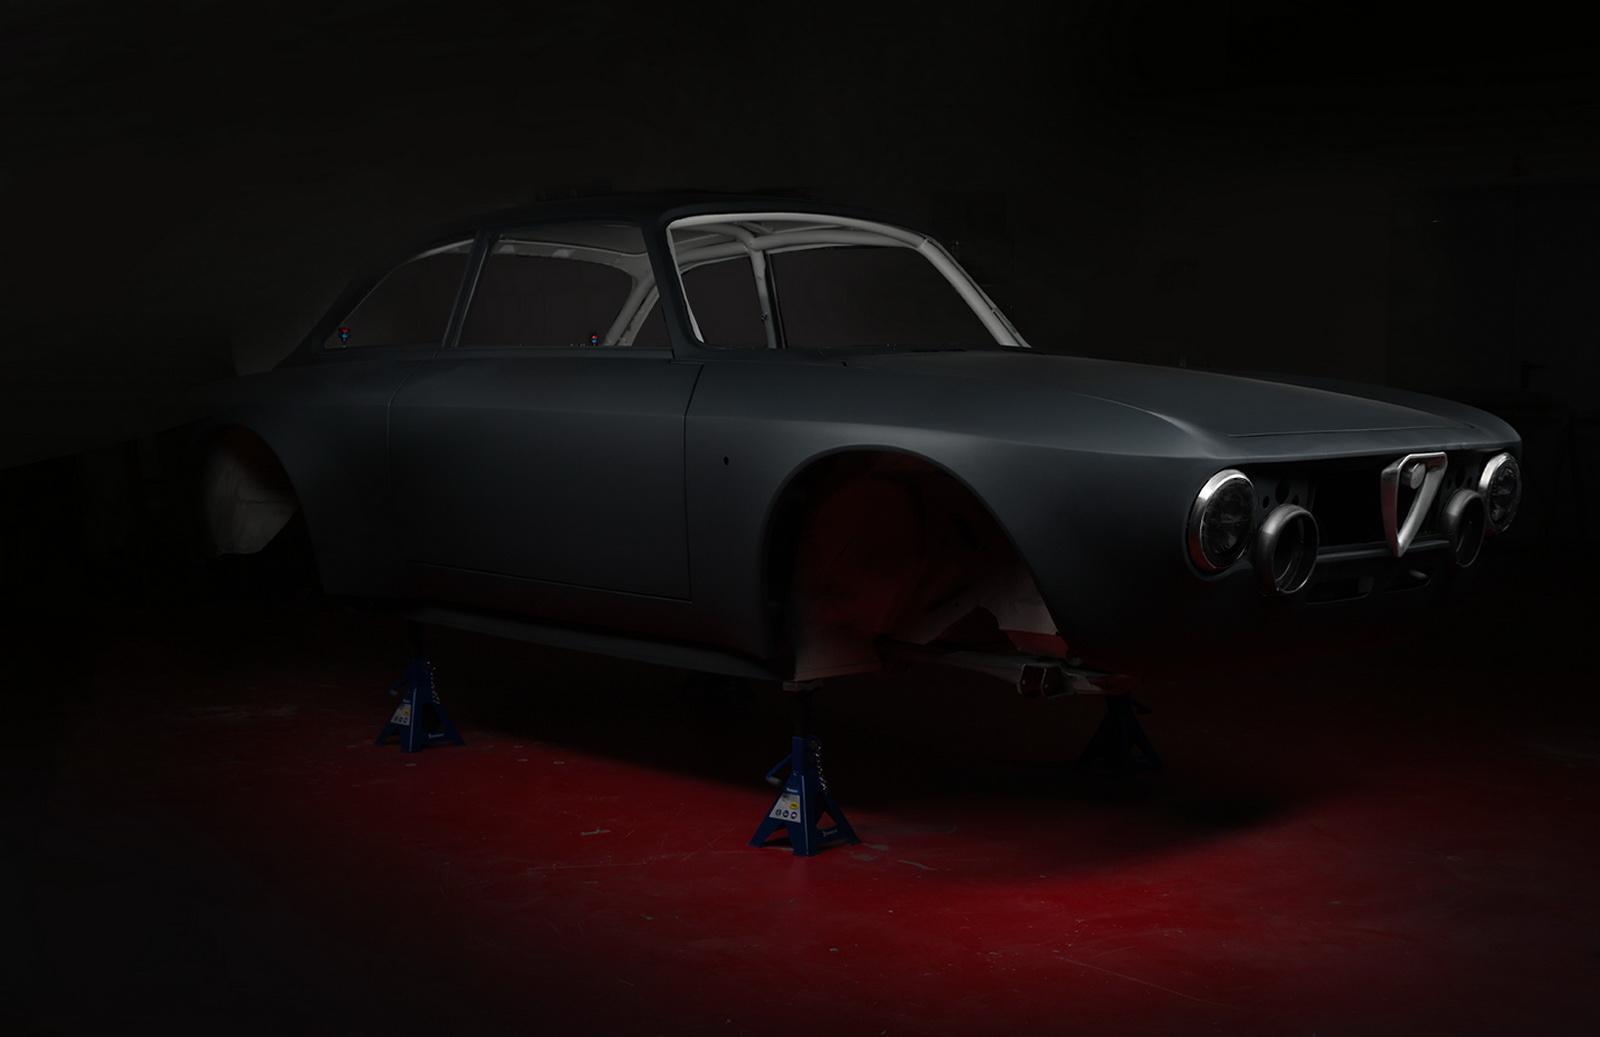 Alfa-Romeo-Giulia-GTelectric-by-Totem-Automobili-1